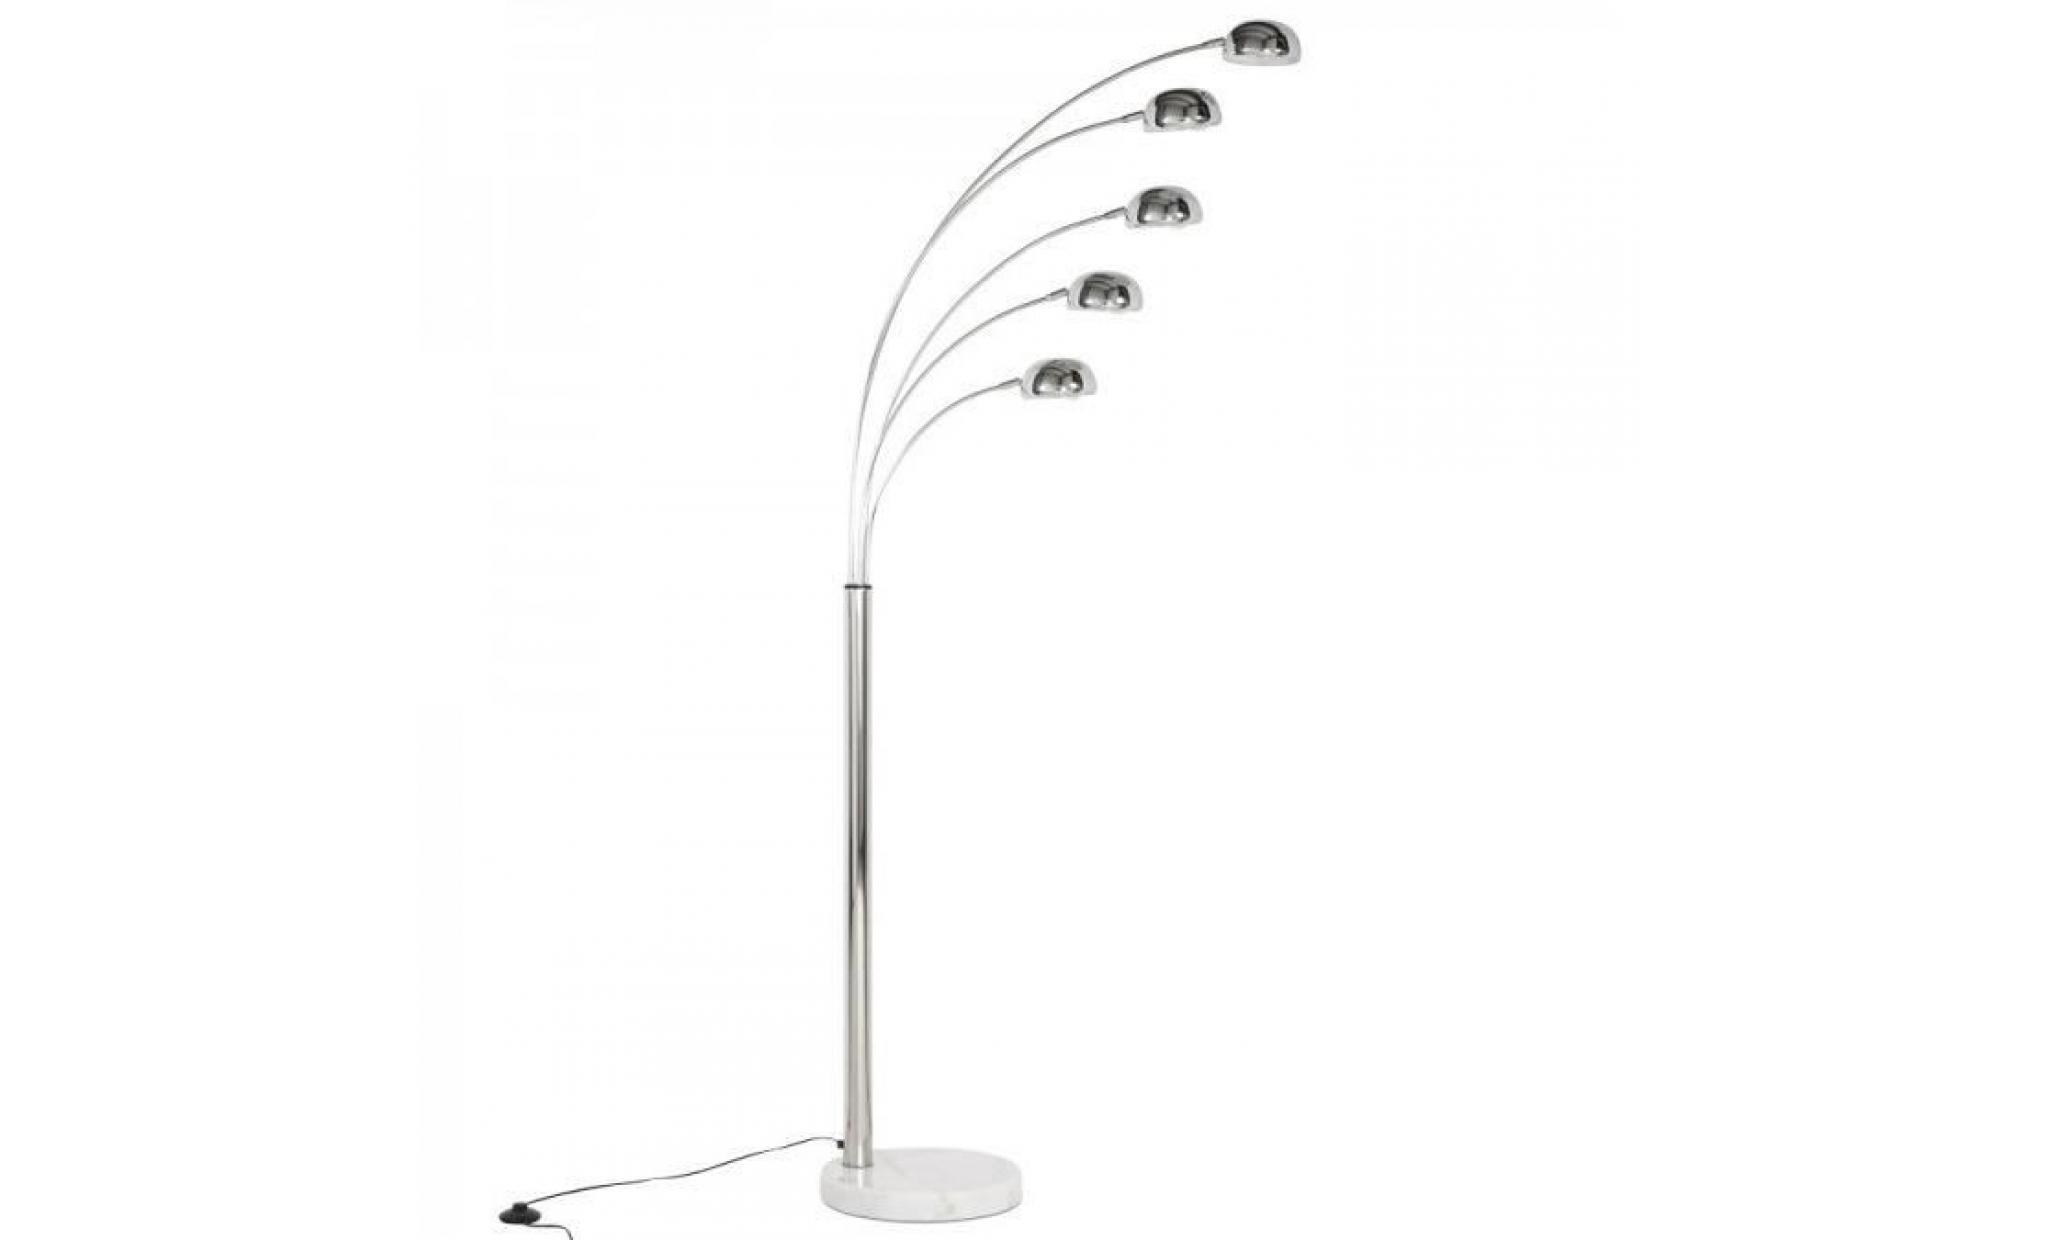 f7c5c6000eb Lampadaire Lounge Five Fingers Kare Design - Achat Vente lampadaire ...